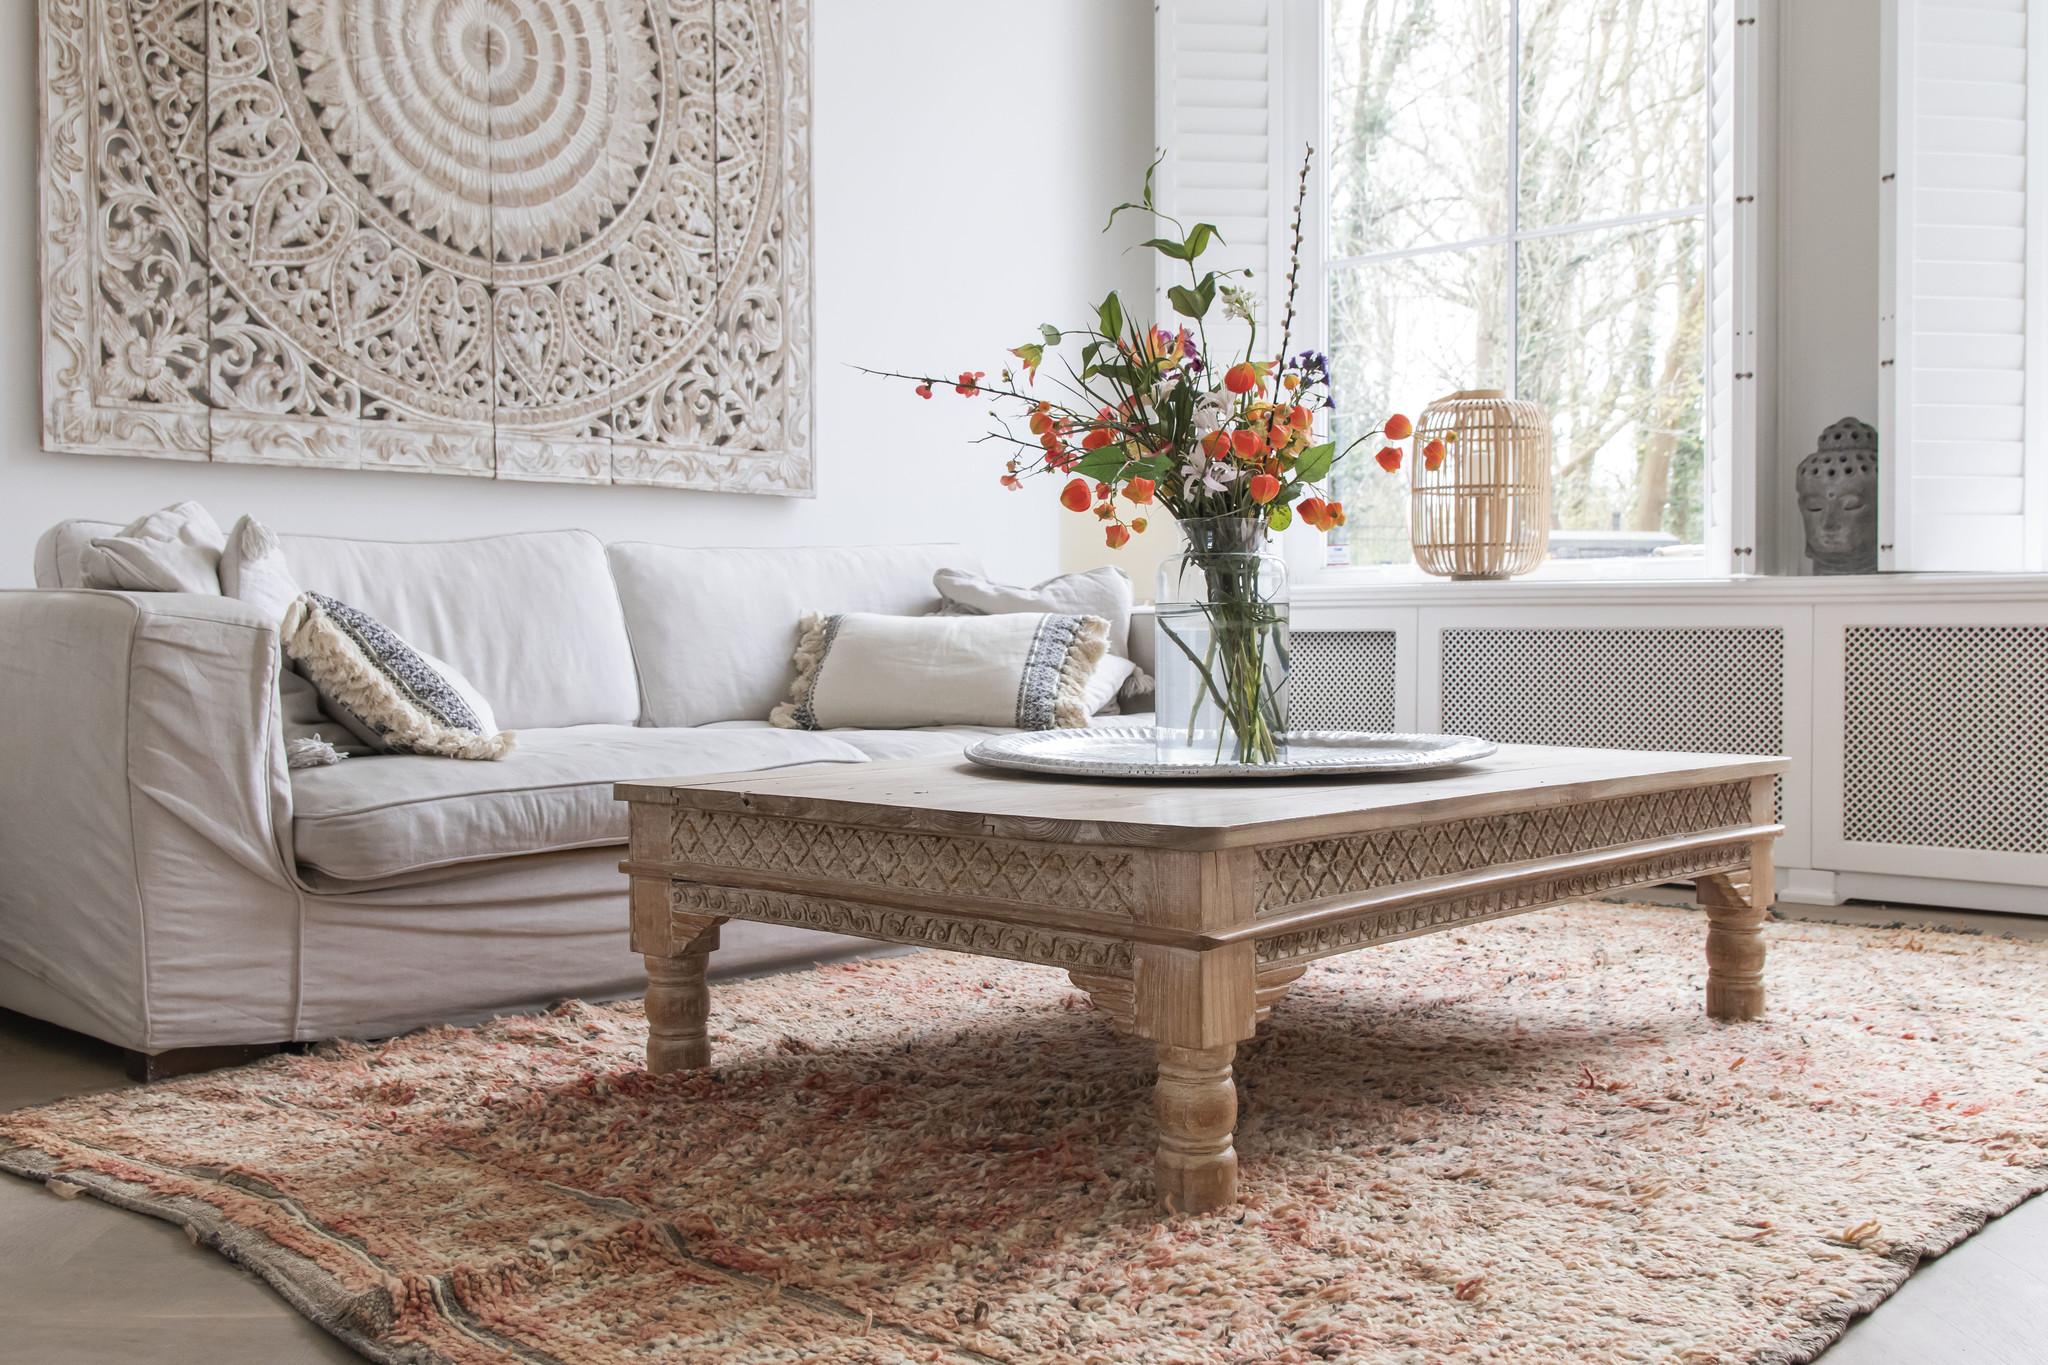 Simply Pure Handgefertigter Vintage Beni M'guild Berber-Teppich aus Marokko  196 x 335 cm